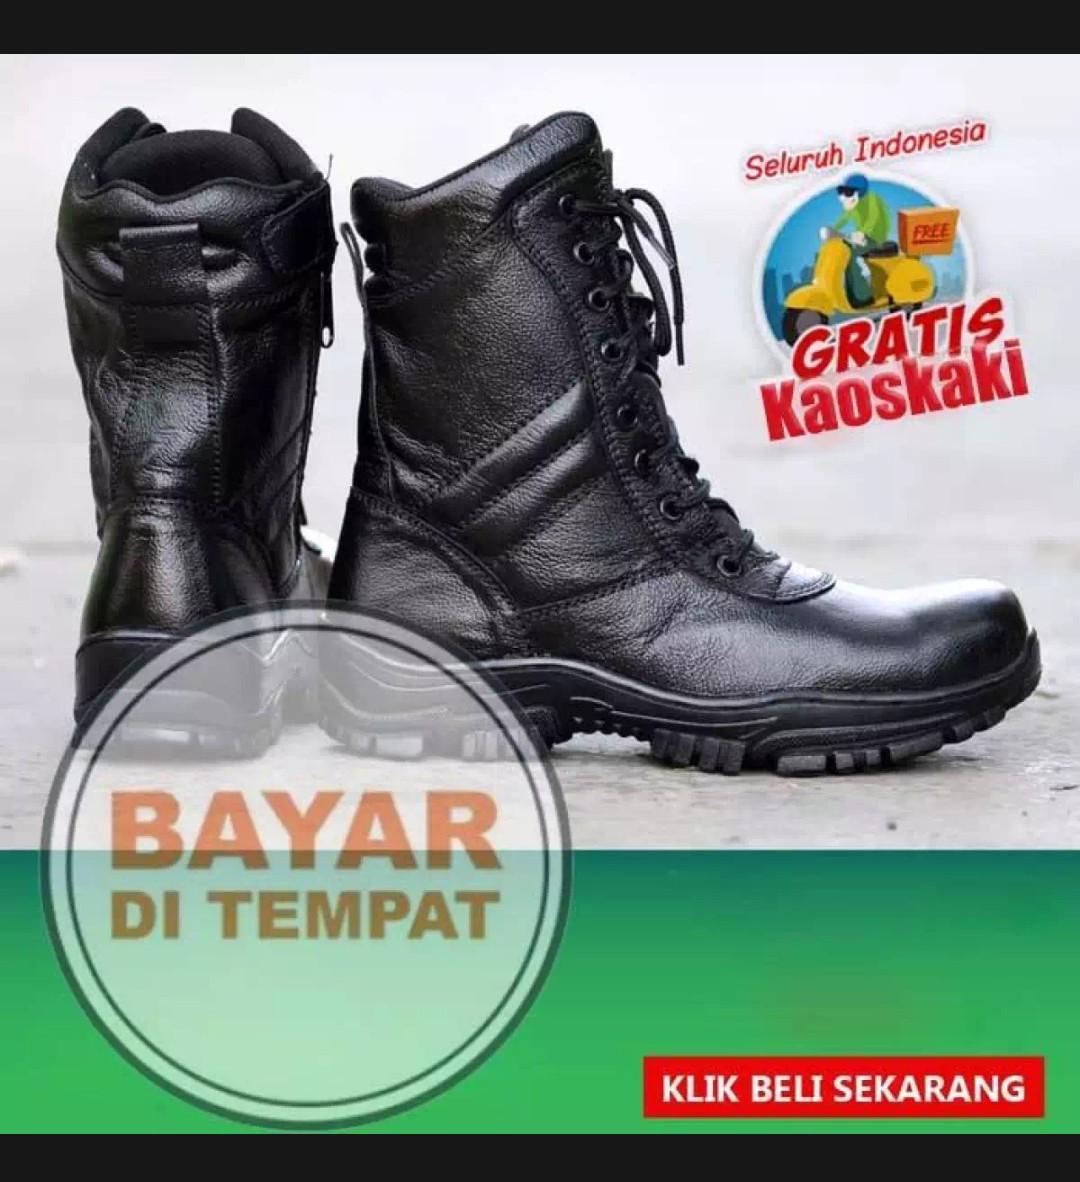 Sepatu PDL TNI AD Termurah JAFERI Sepatu Pdl Tni PDLG - Hitam   Sepatu Pdl  Delta 248f245f1b